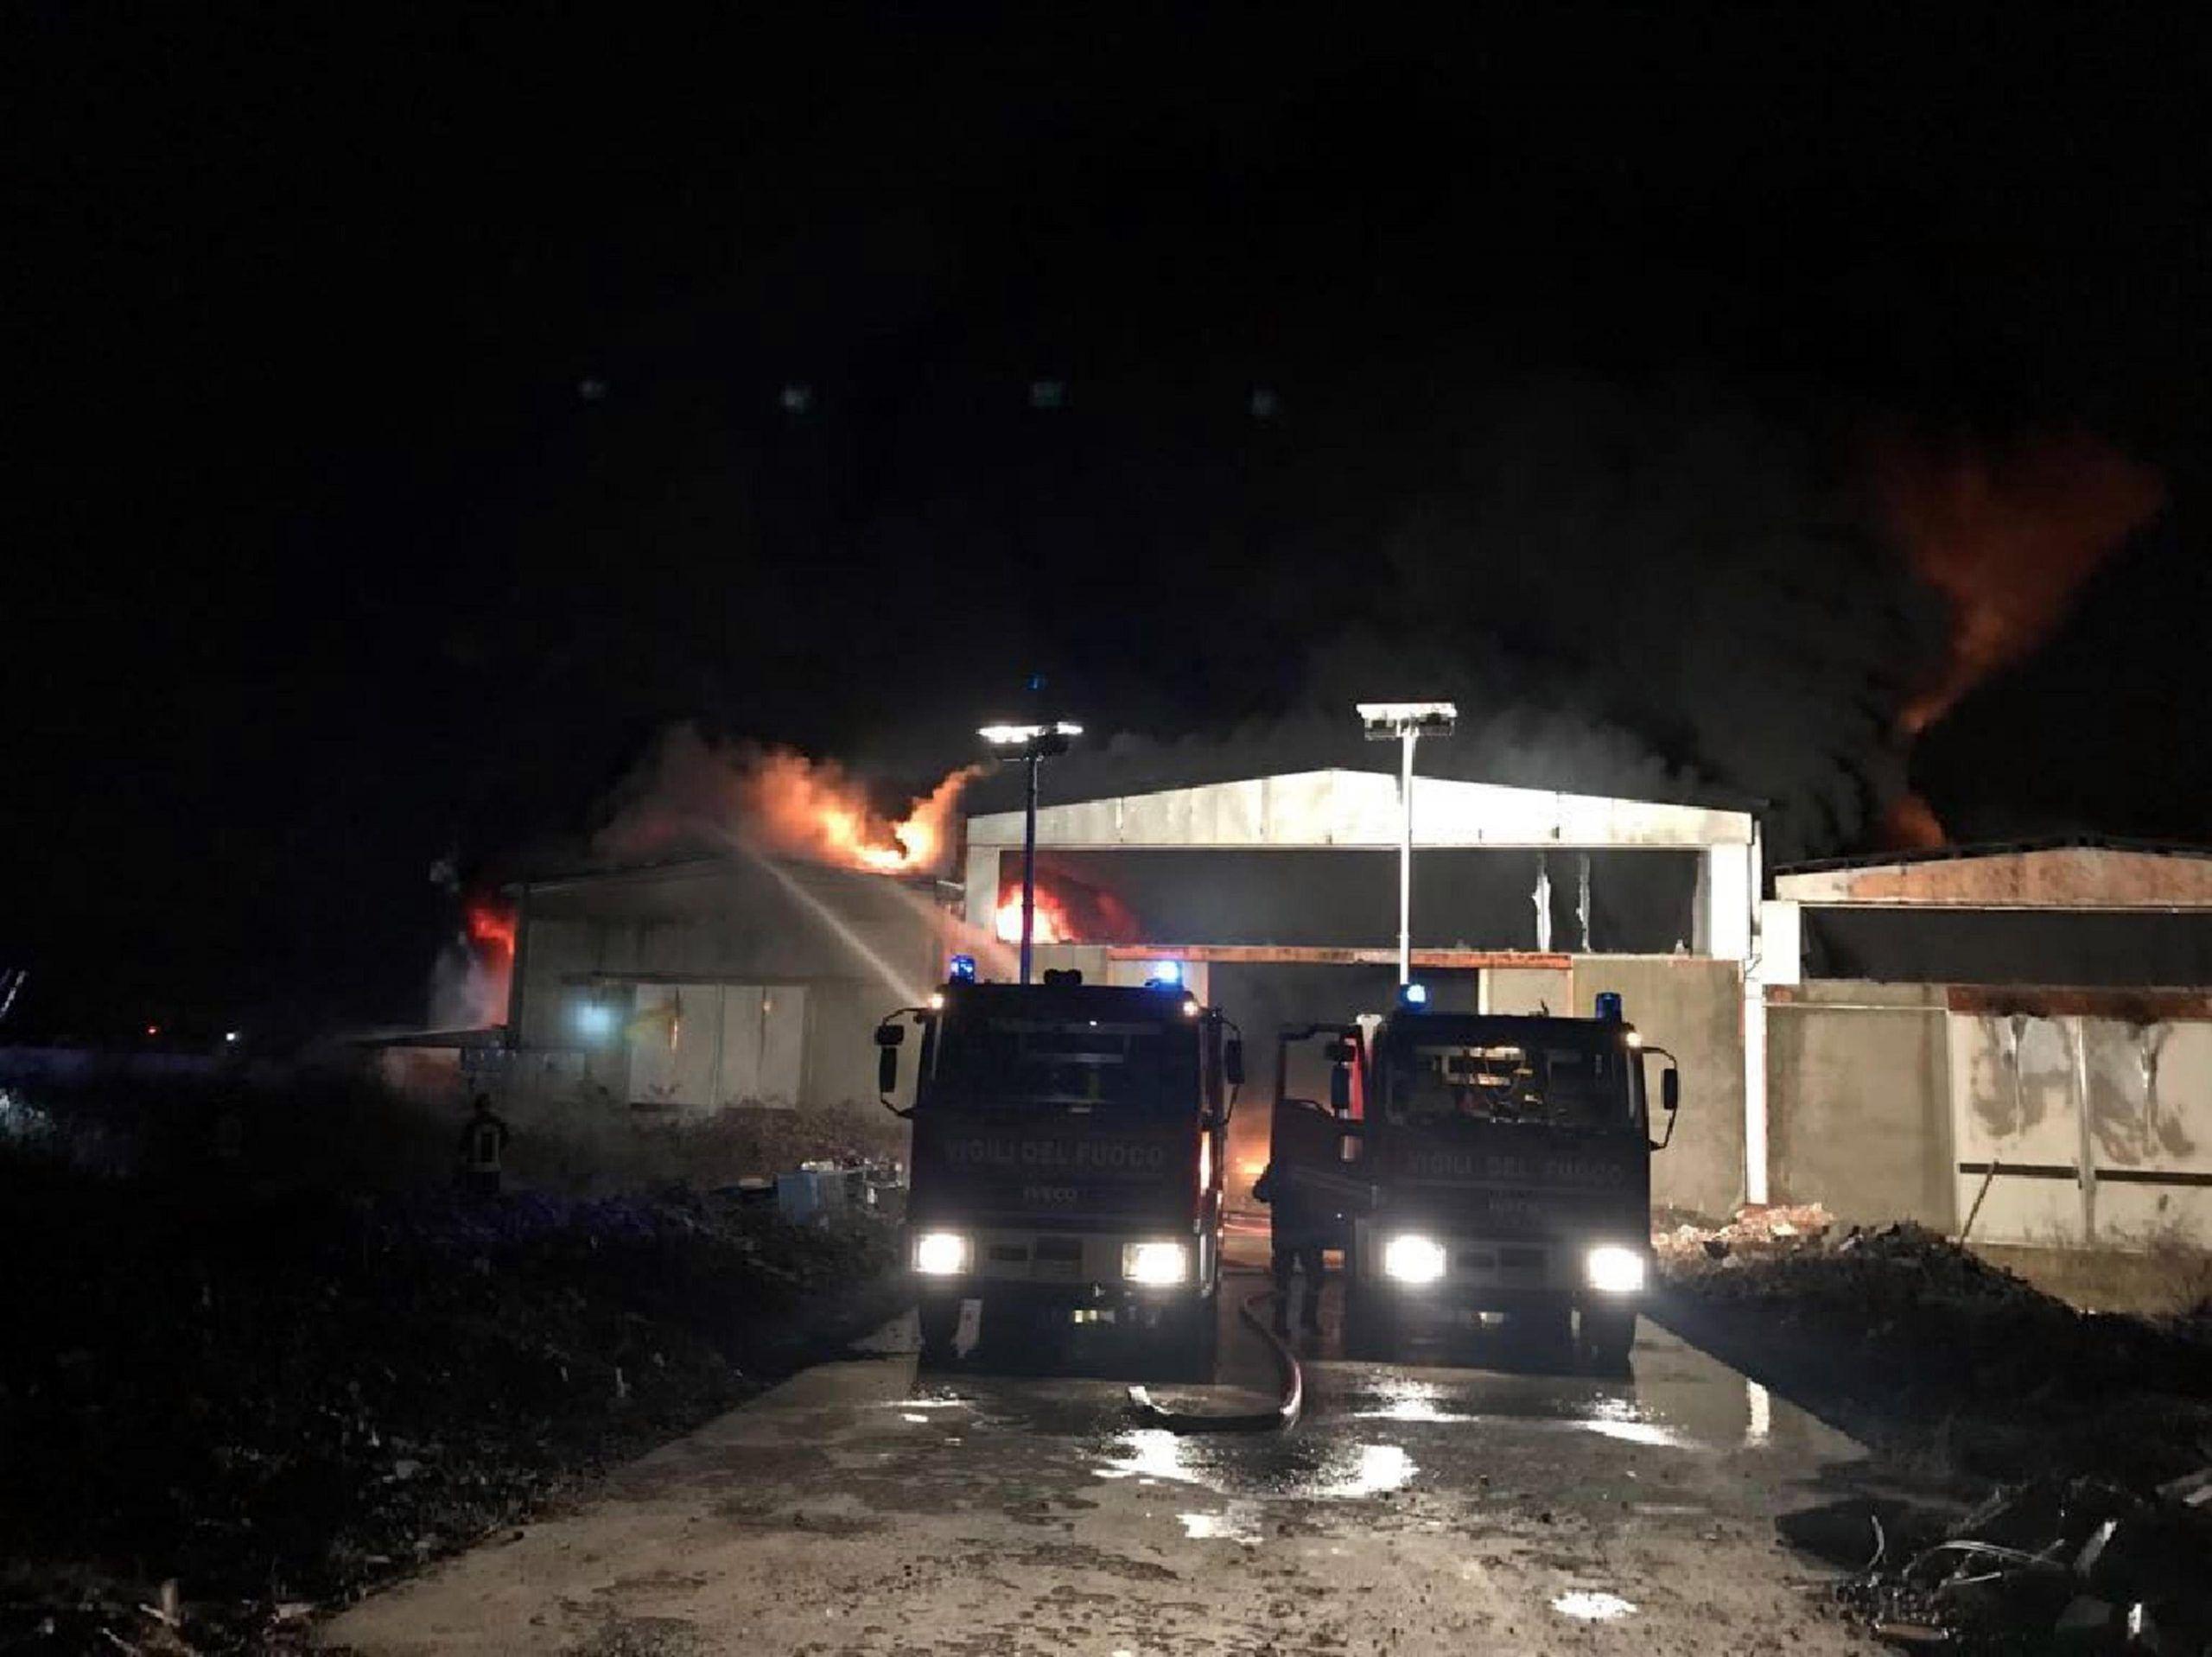 Pavia, incendio in capannone industriale: allarme nube tossica, evacuate 100 persone